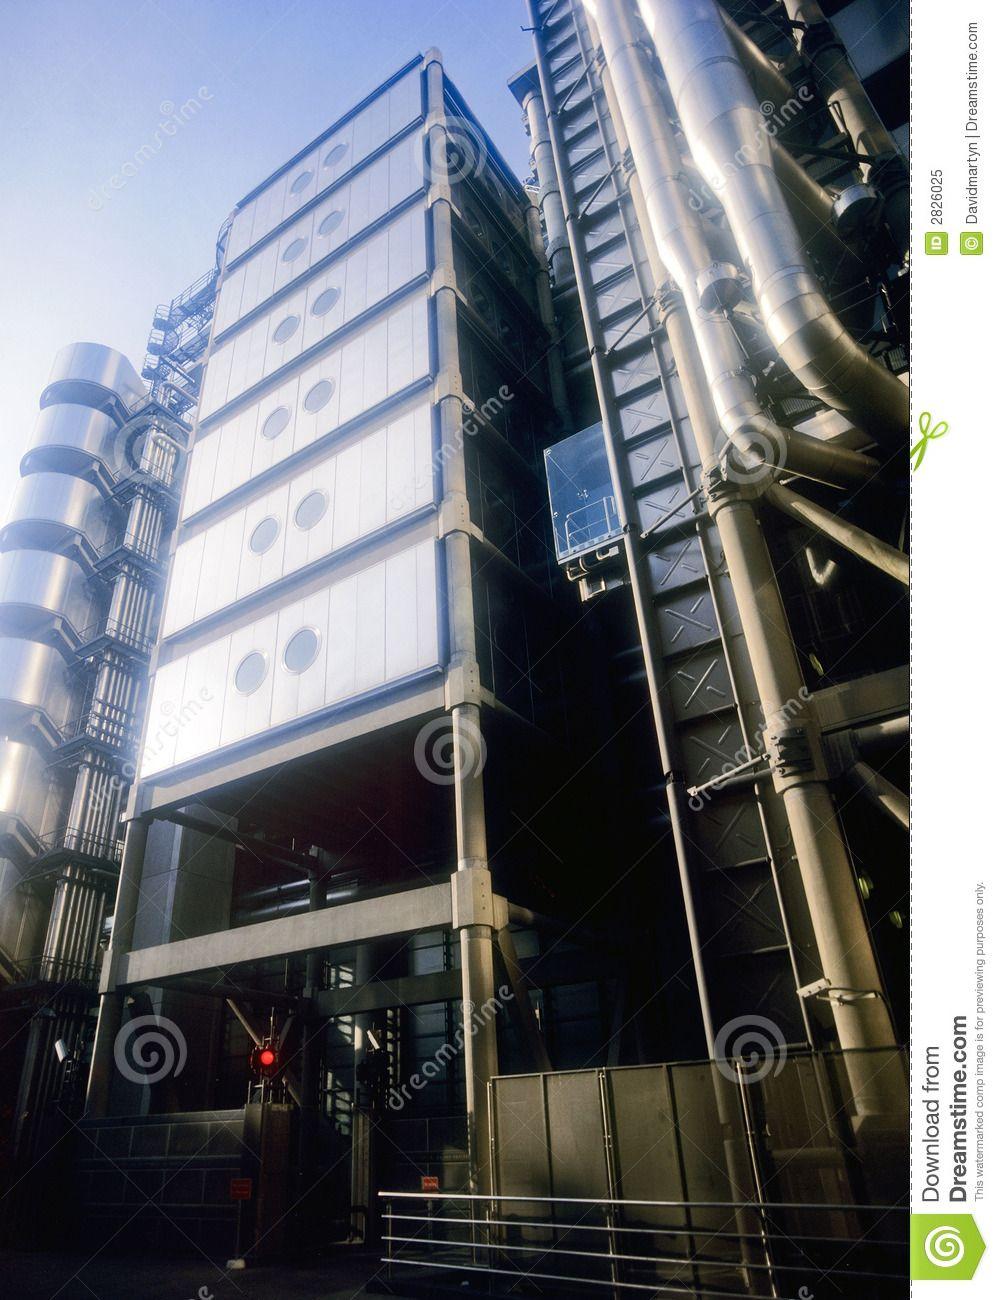   Lloyds of London   Lloyds of London insurance company building London England UK Europe.